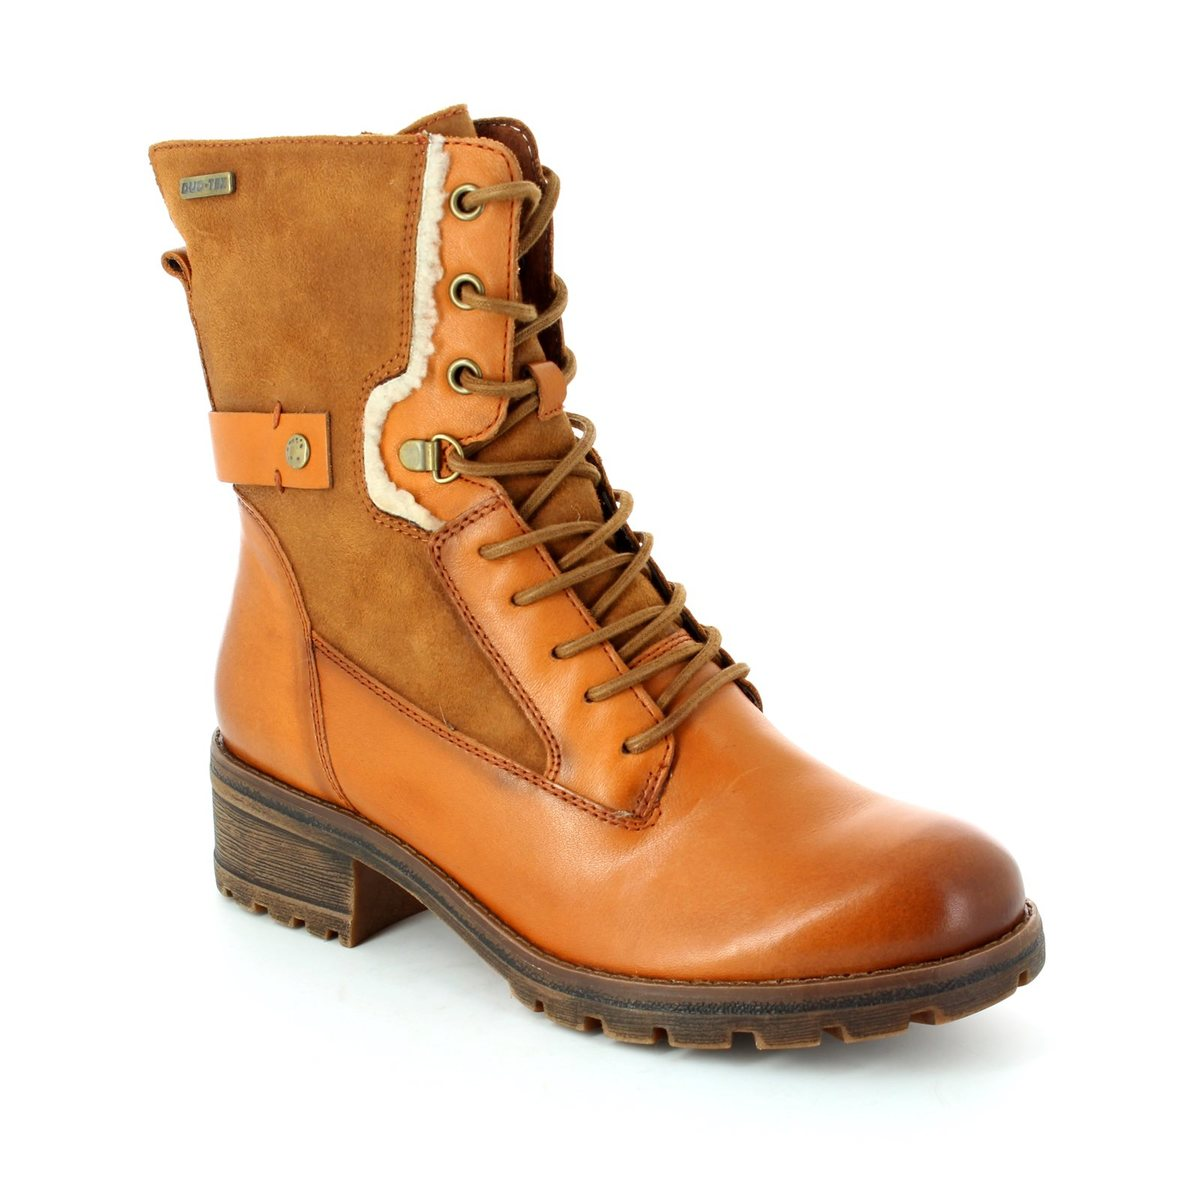 tamaris 26225 310 tan ankle boots. Black Bedroom Furniture Sets. Home Design Ideas